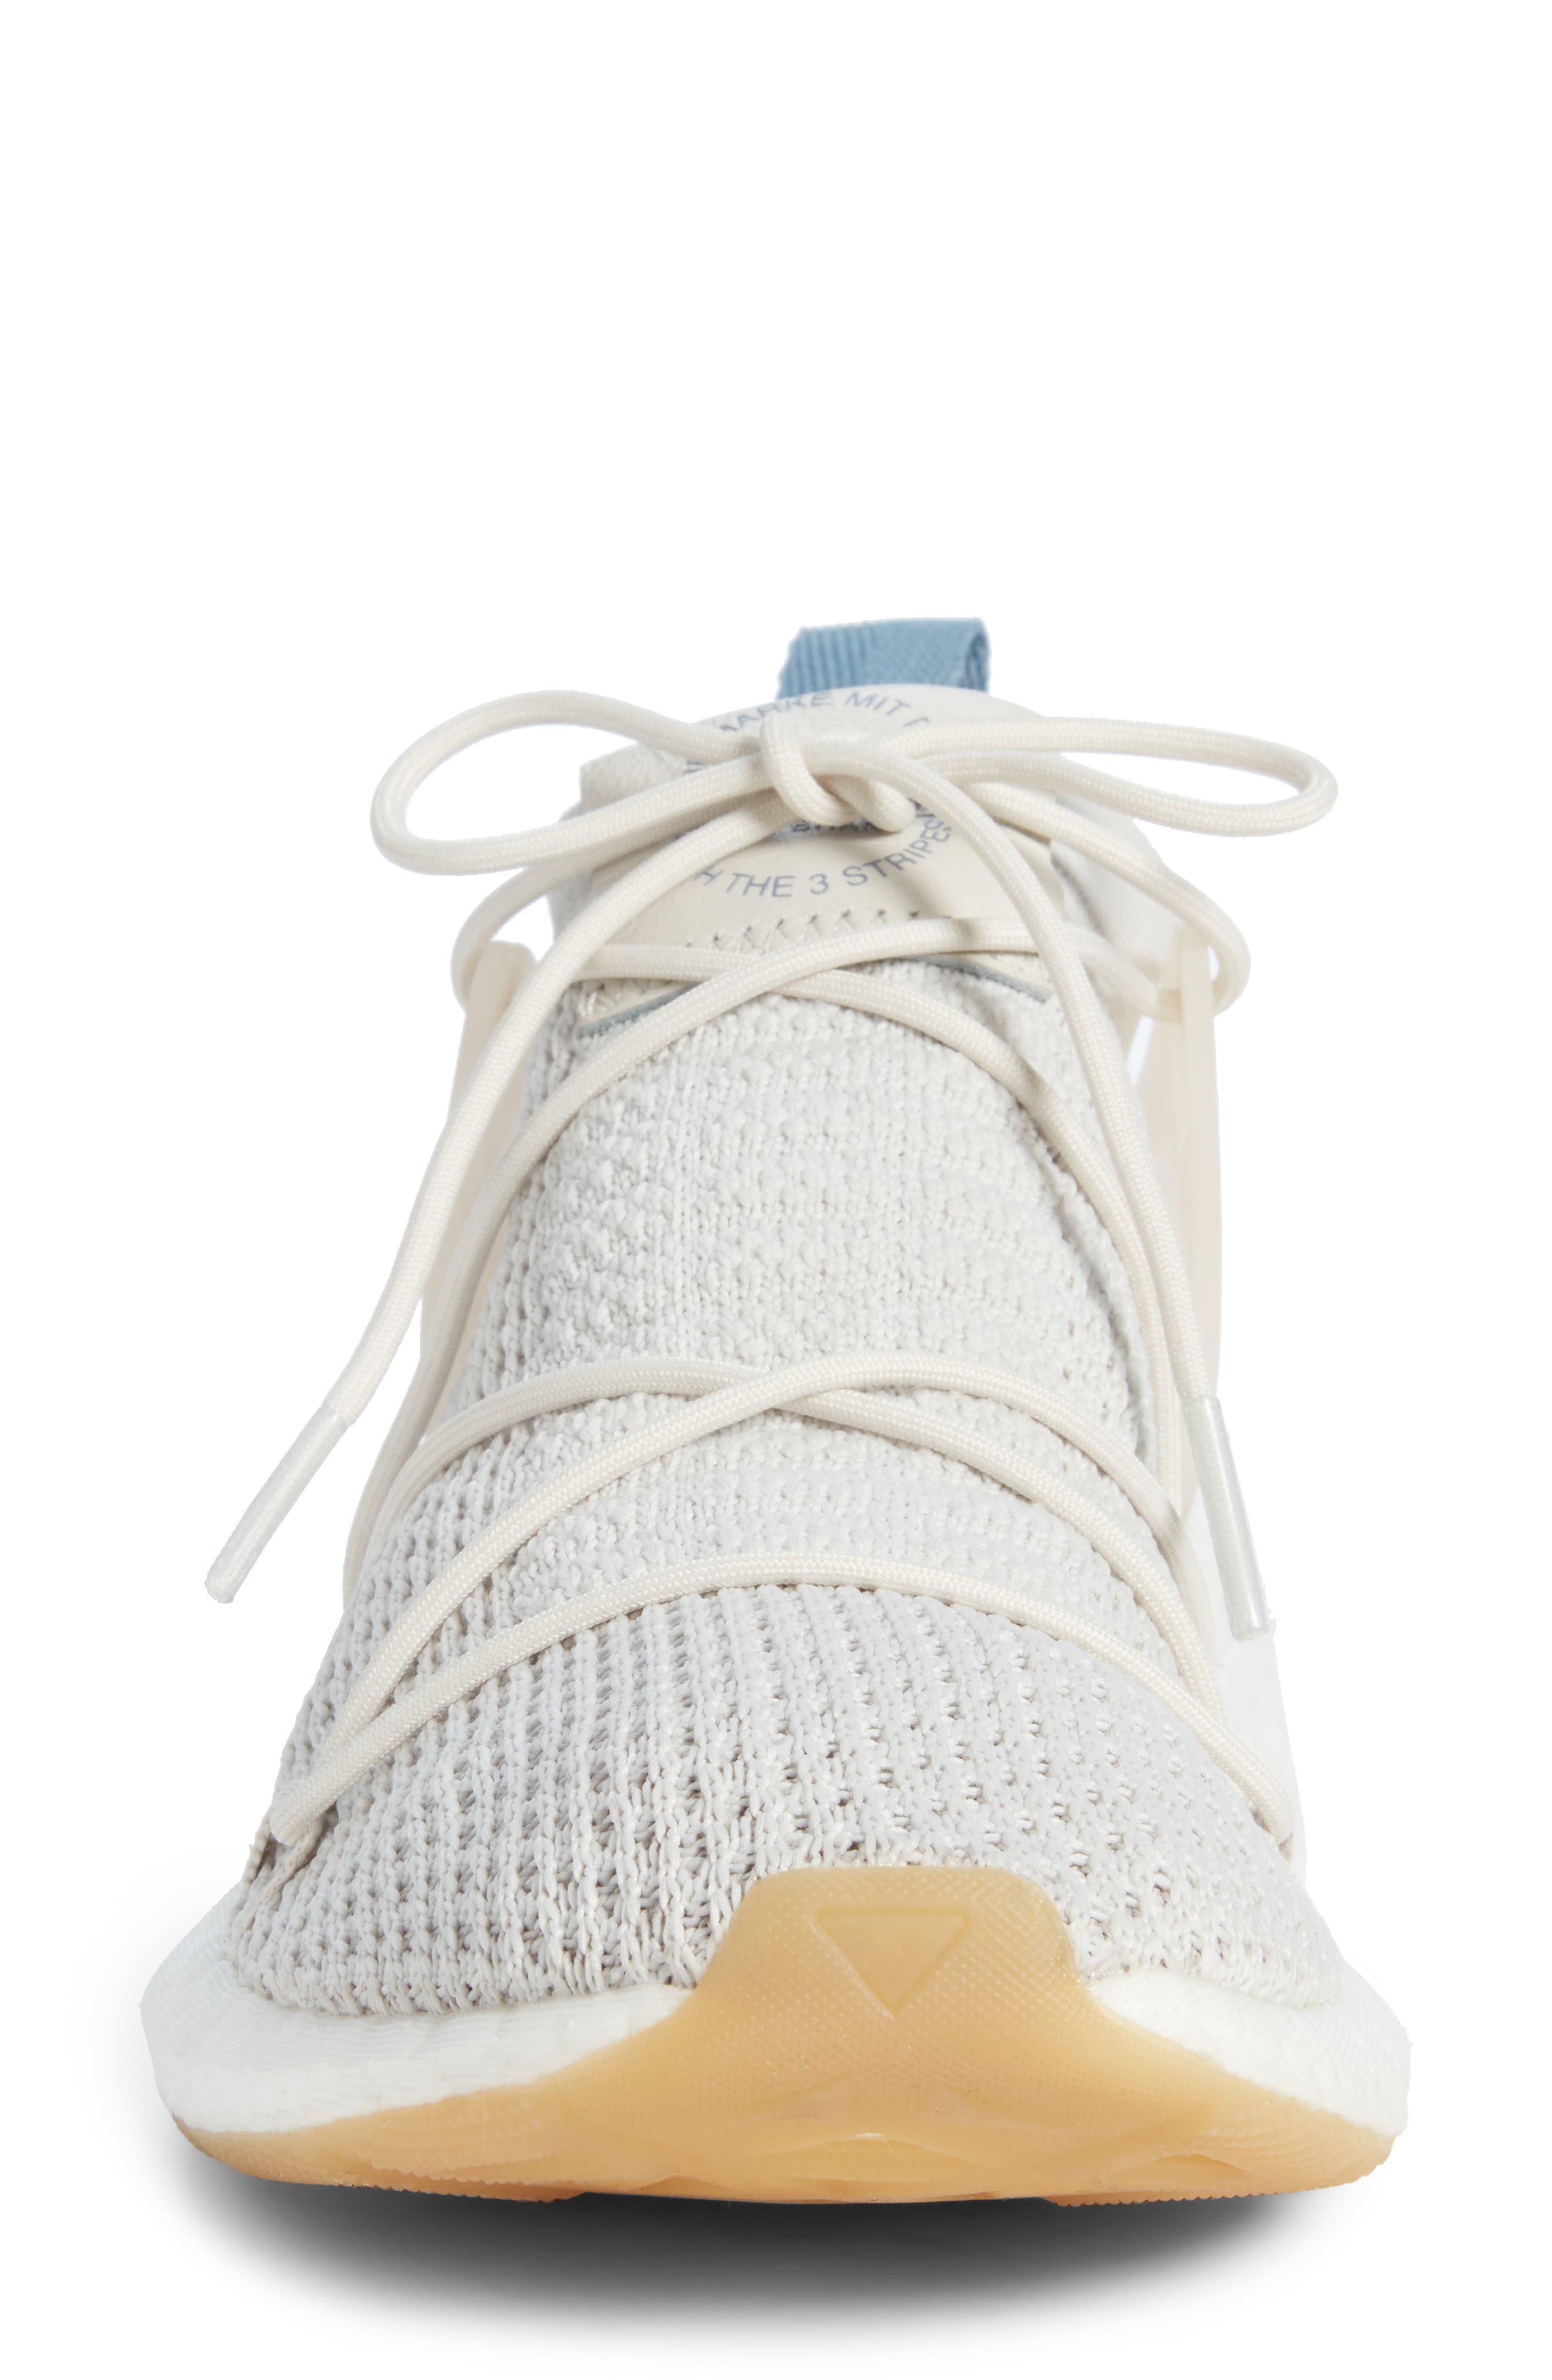 Arkyn Primeknit Sneaker,                             Alternate thumbnail 4, color,                             TALC/ TALC/ LINEN